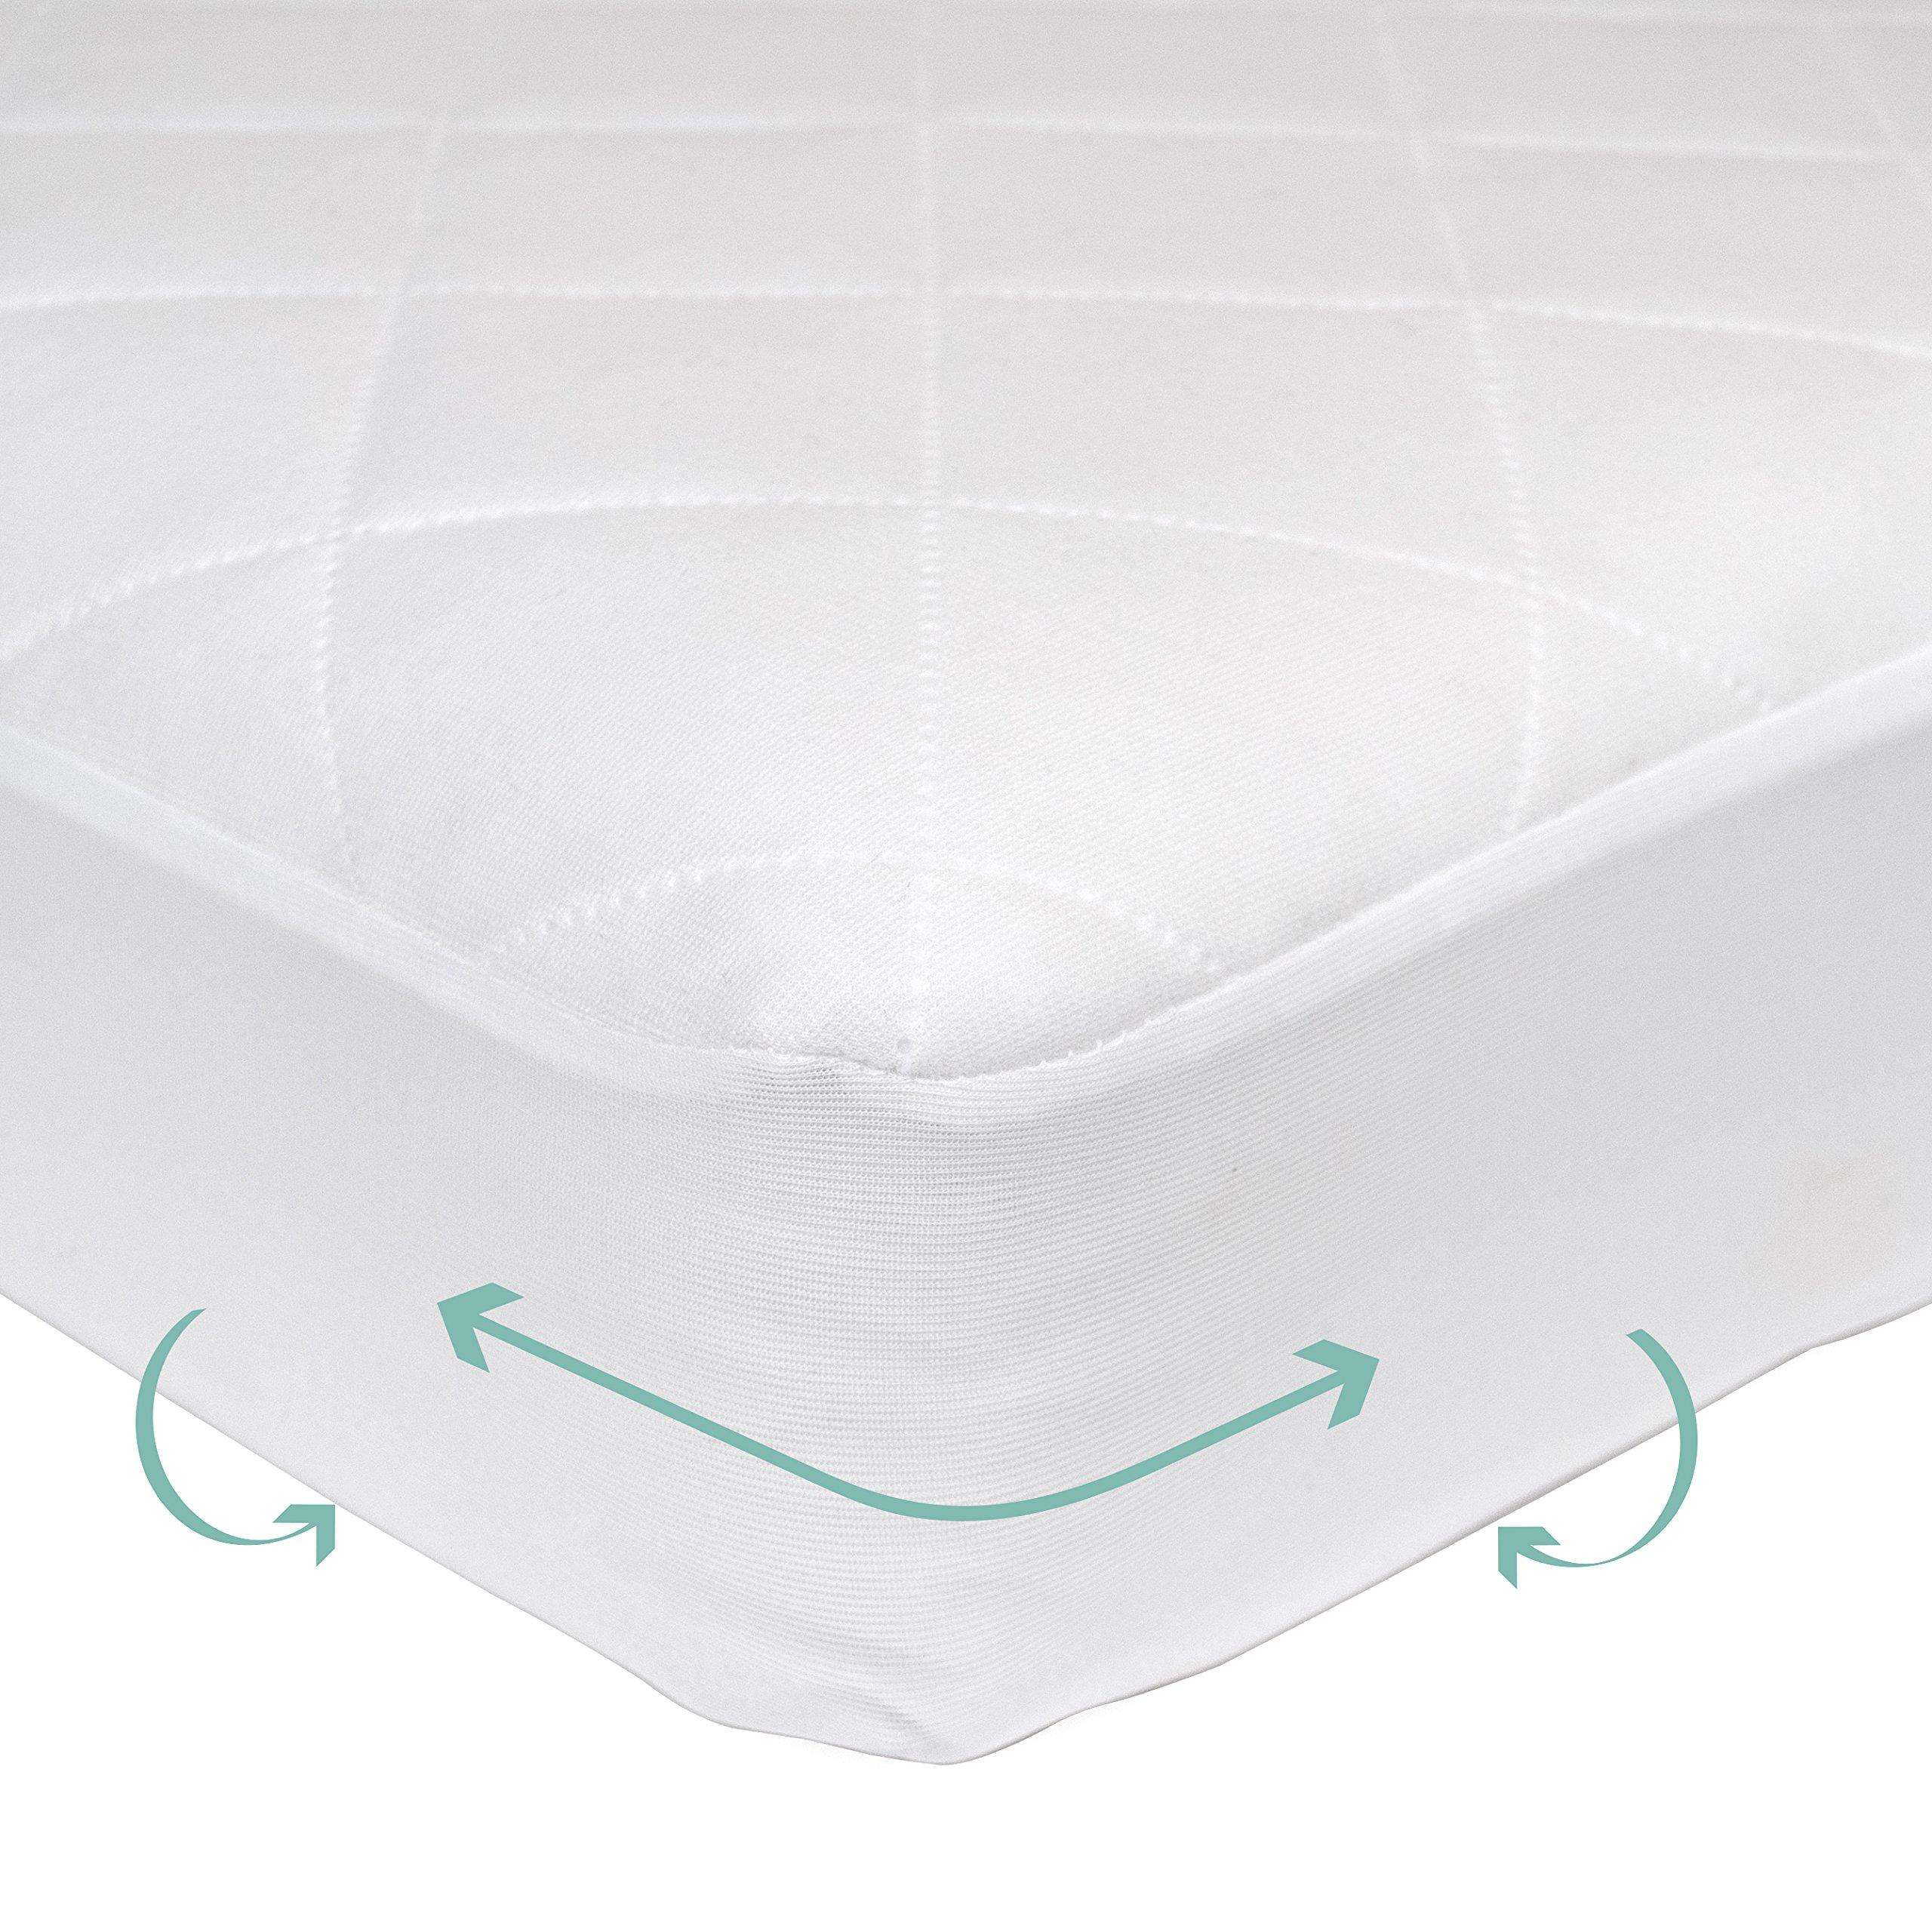 Kolcraft Baby Dri Waterproof Crib and Toddler Mattress Pad Cover, White, 52'' x 28''